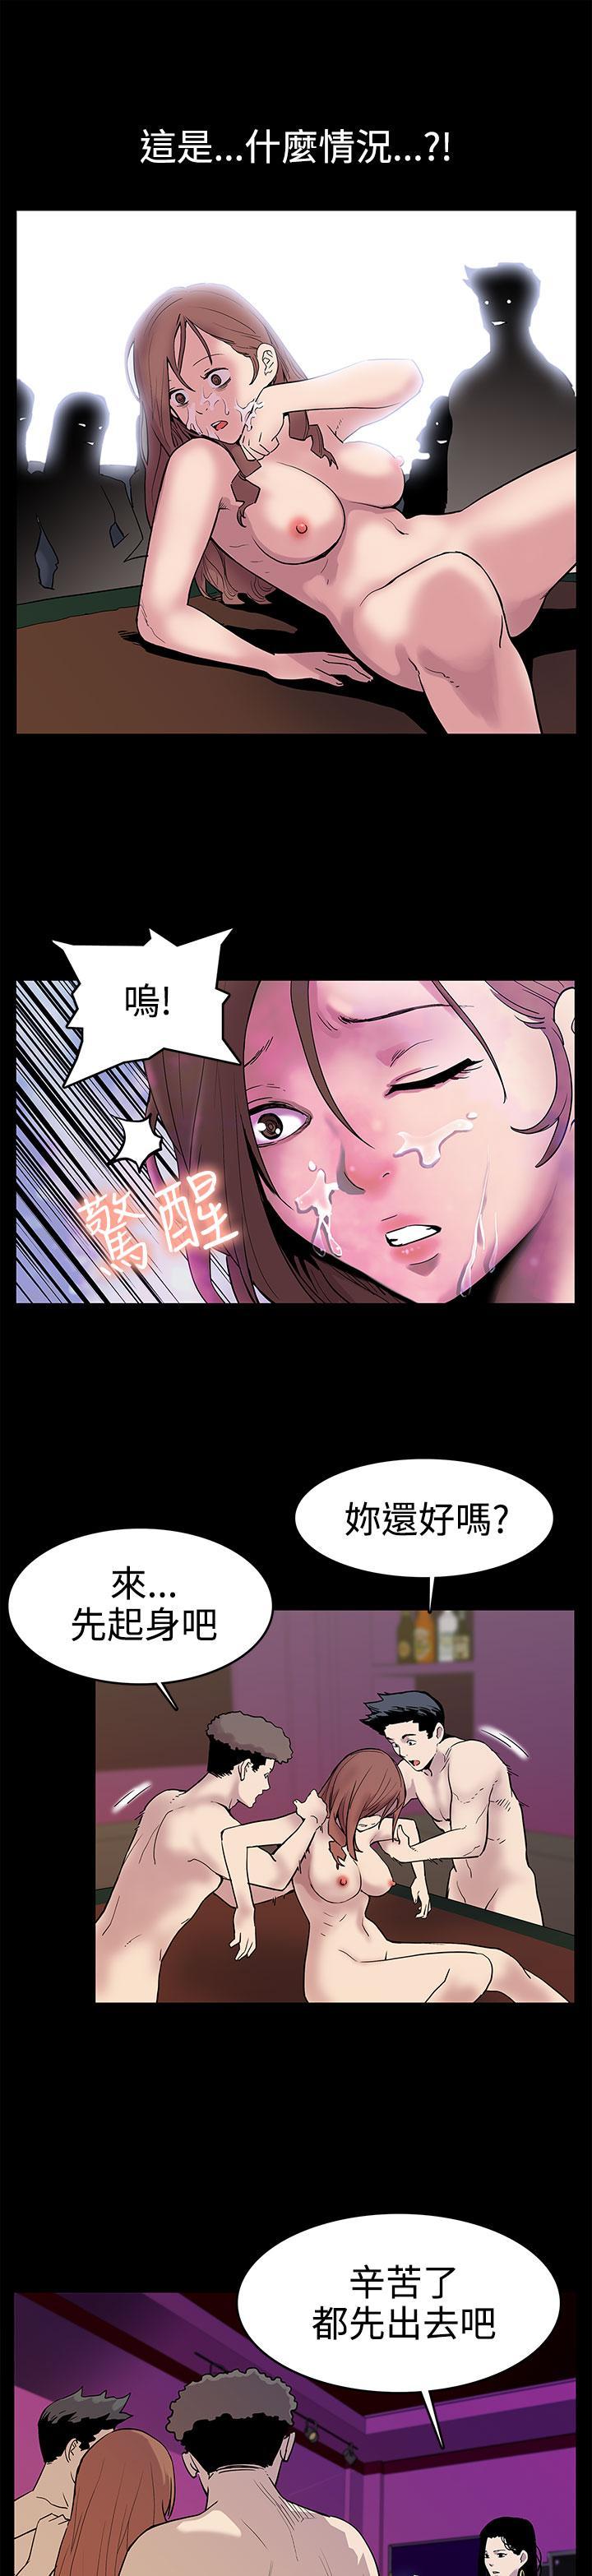 Mom cafe 第1話 [Chinese]中文 20